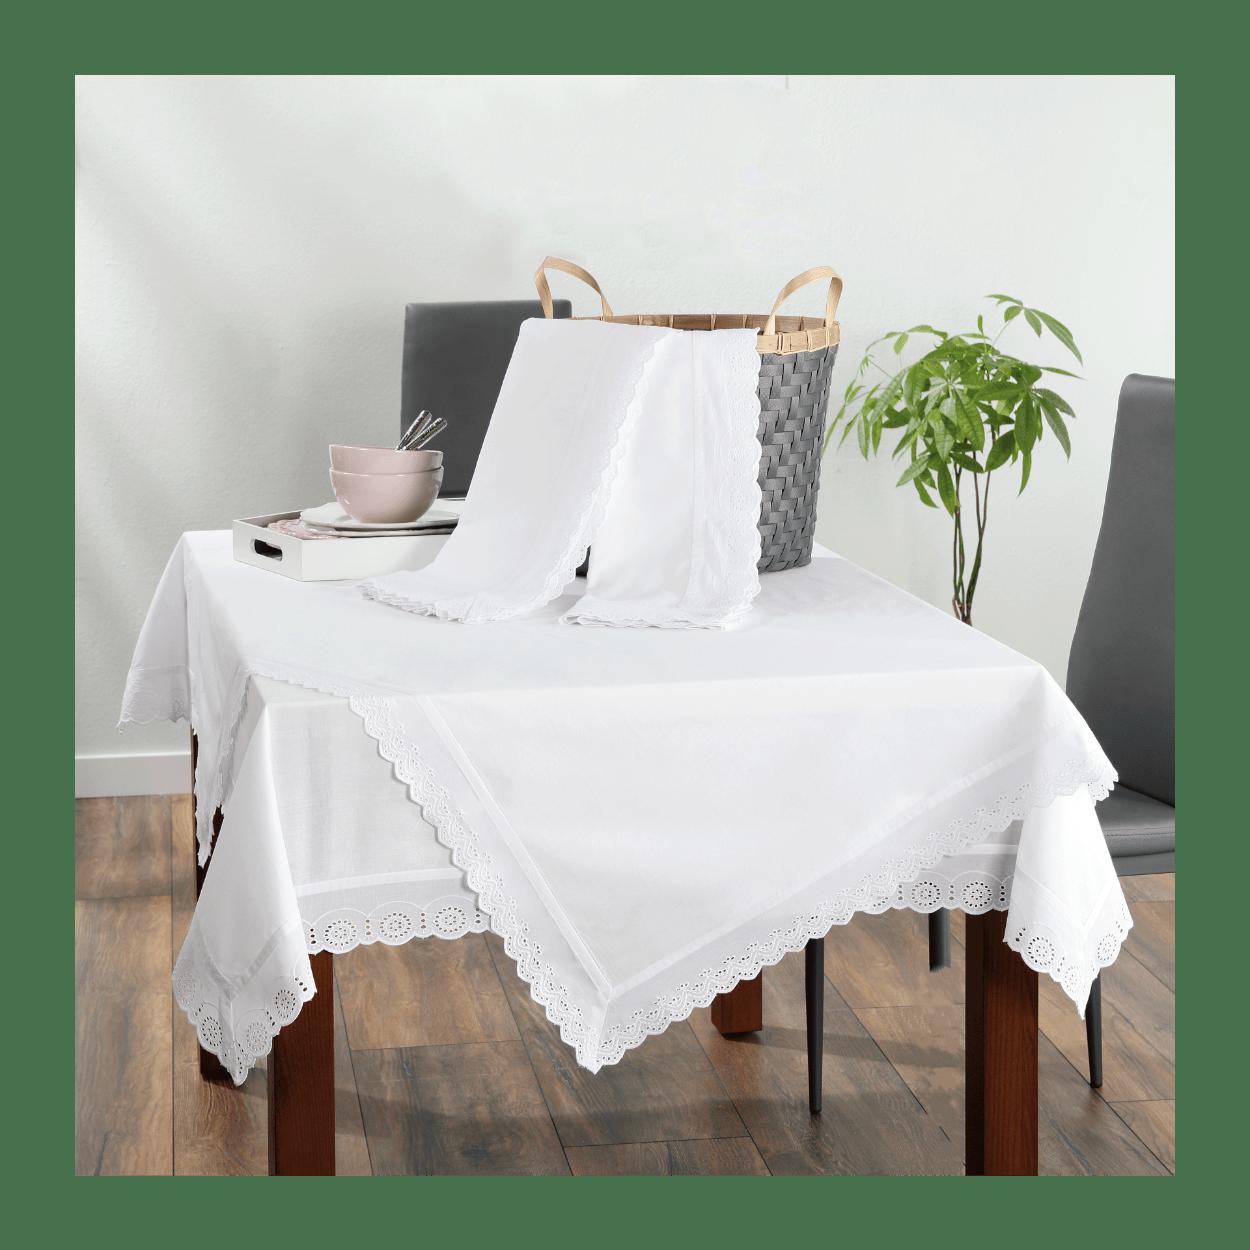 wit tafelkleed op tafel